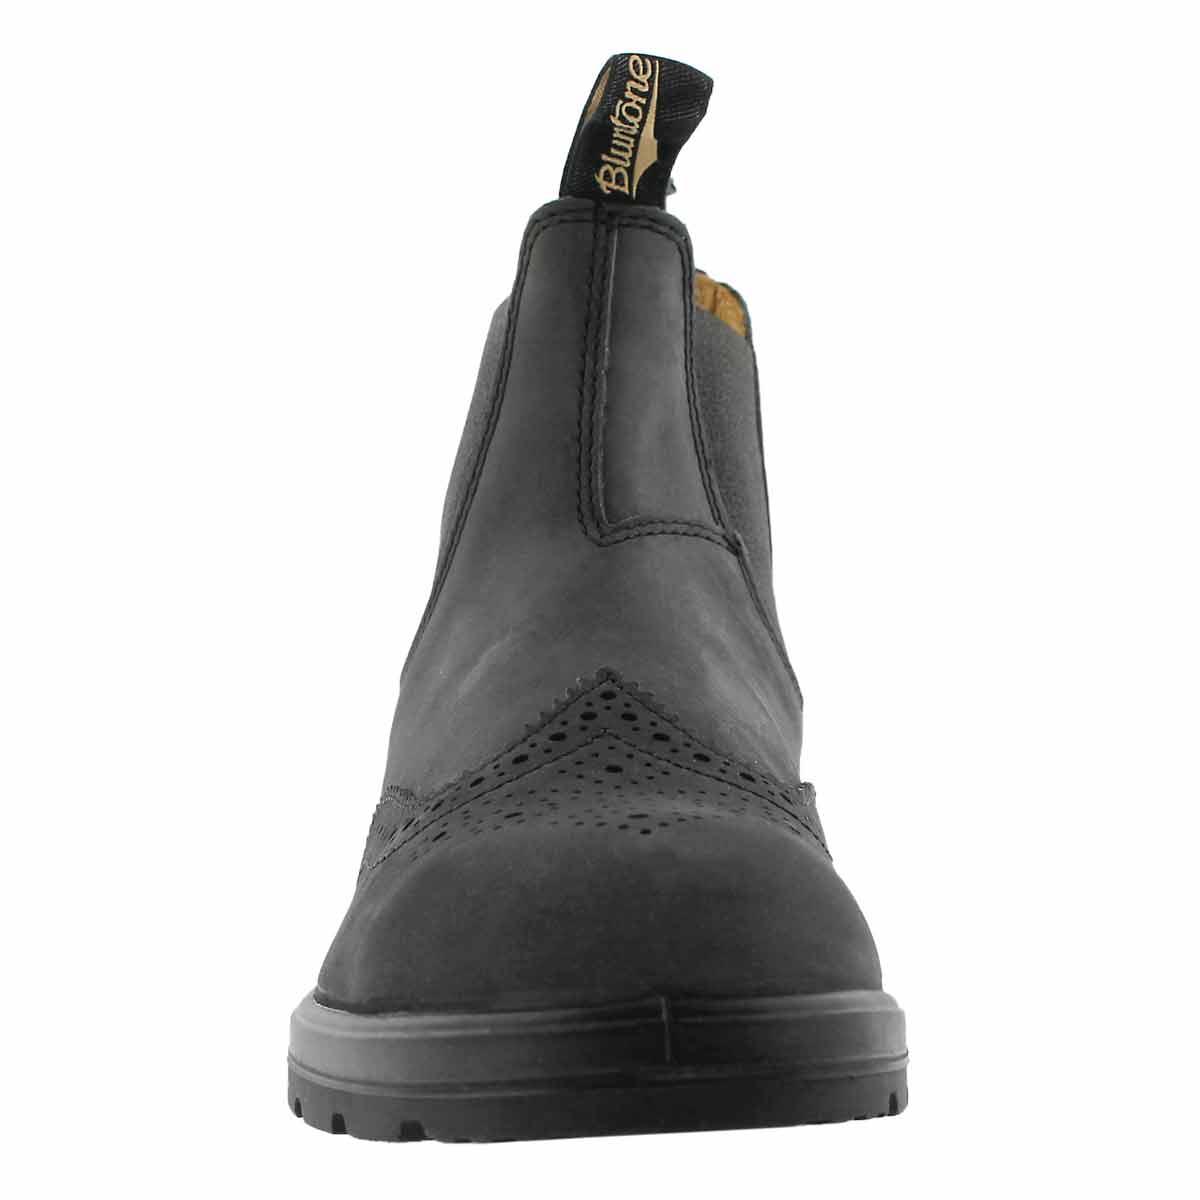 Unisex Brogue rustic blk twin gore boot